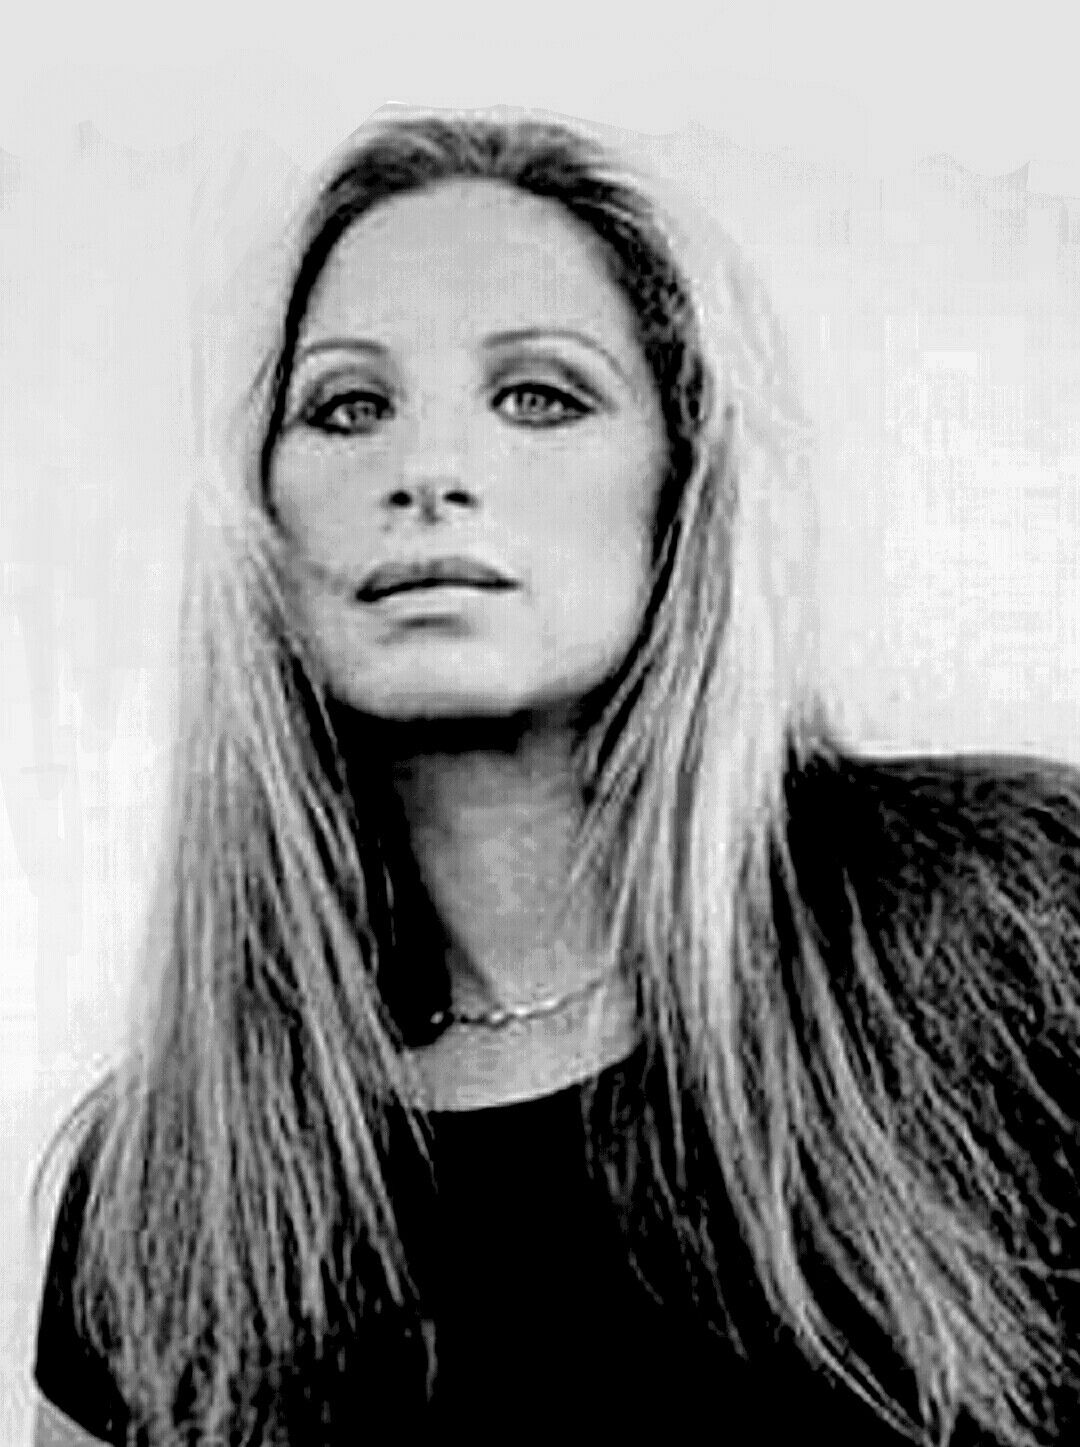 Barbra Streisand, great voice & actress | Barbra Streisand